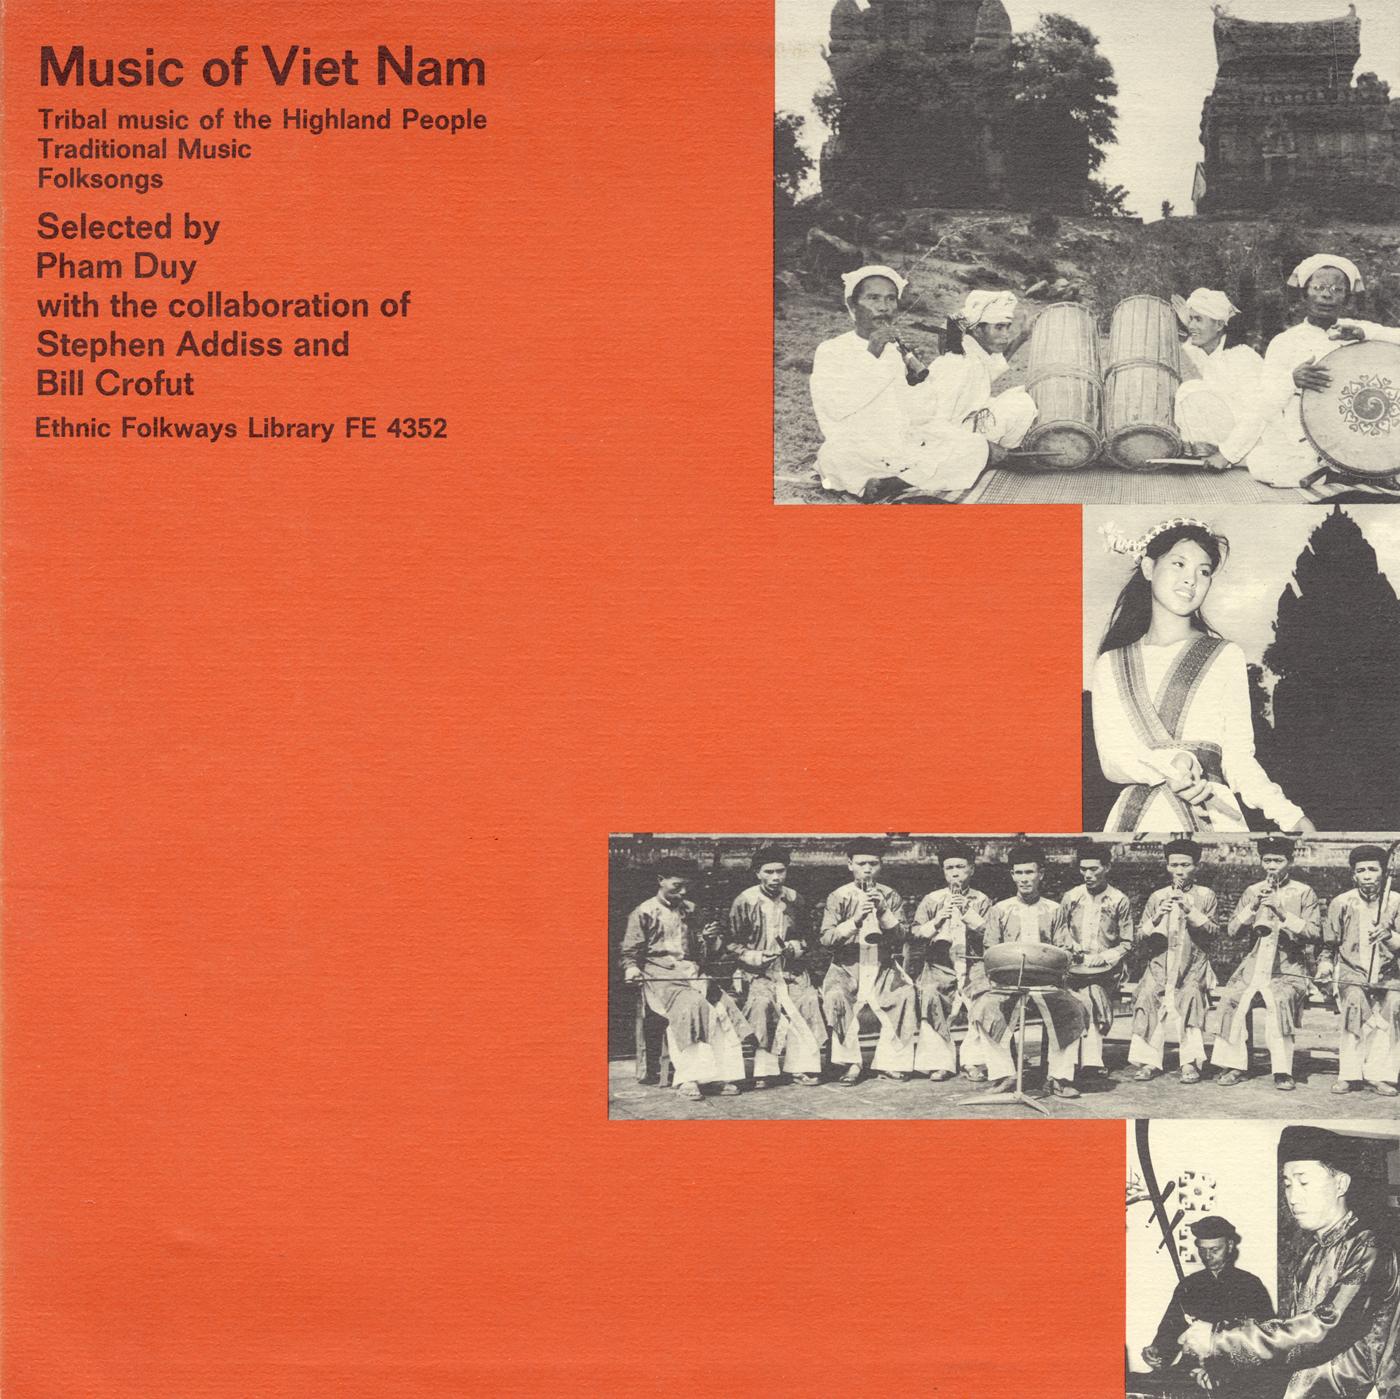 Music of Vietnam | Smithsonian Folkways Recordings